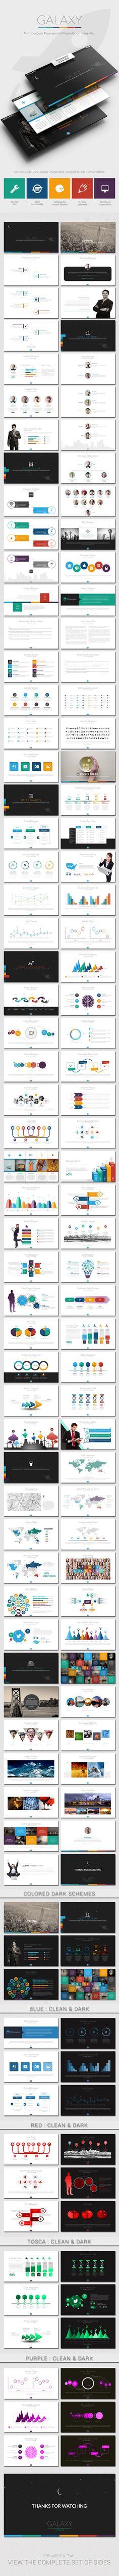 Powerpoint Template #powerpoint #powerpointtemplate Download: http://graphicriver.net/item/galaxy-powerpoint-template/10338206?ref=ksioks